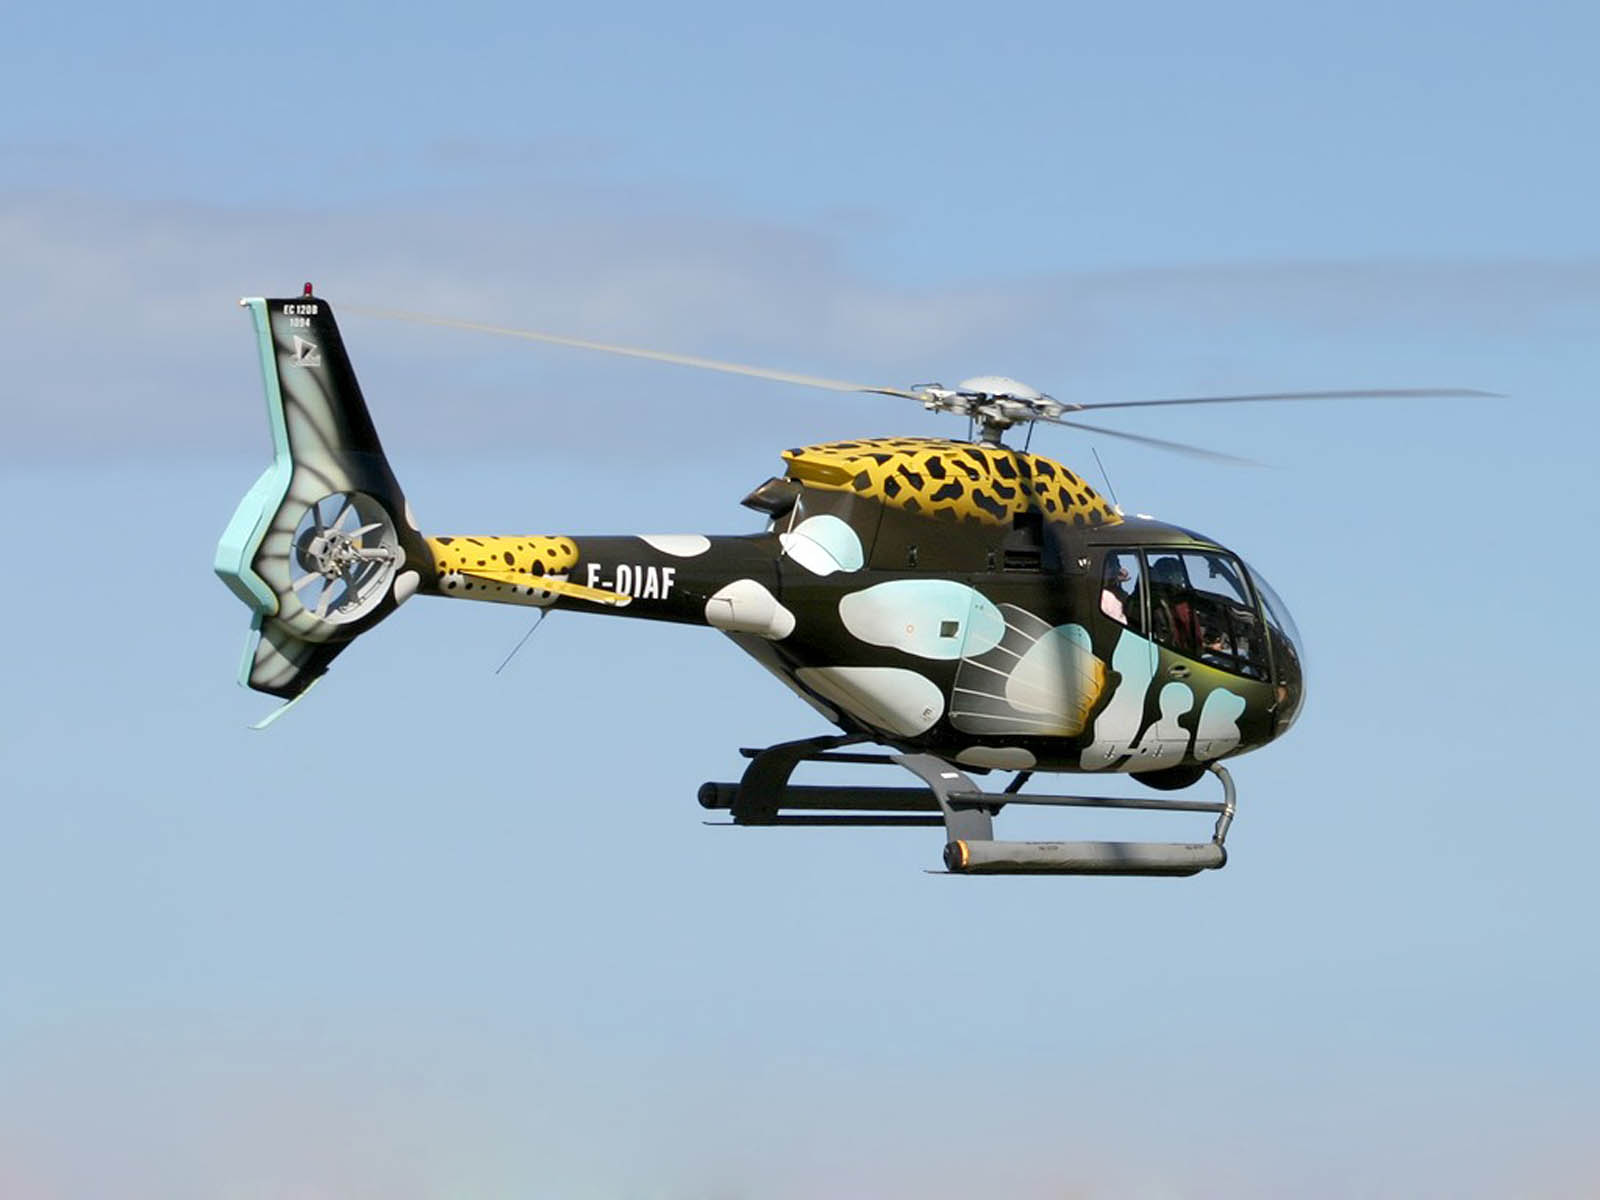 http://4.bp.blogspot.com/-wyzS7R5WSCw/UDHmr151M6I/AAAAAAAAHsA/NOyxK6VZor4/s1600/Eurocopter+EC+120+Wallpapers+8.jpg